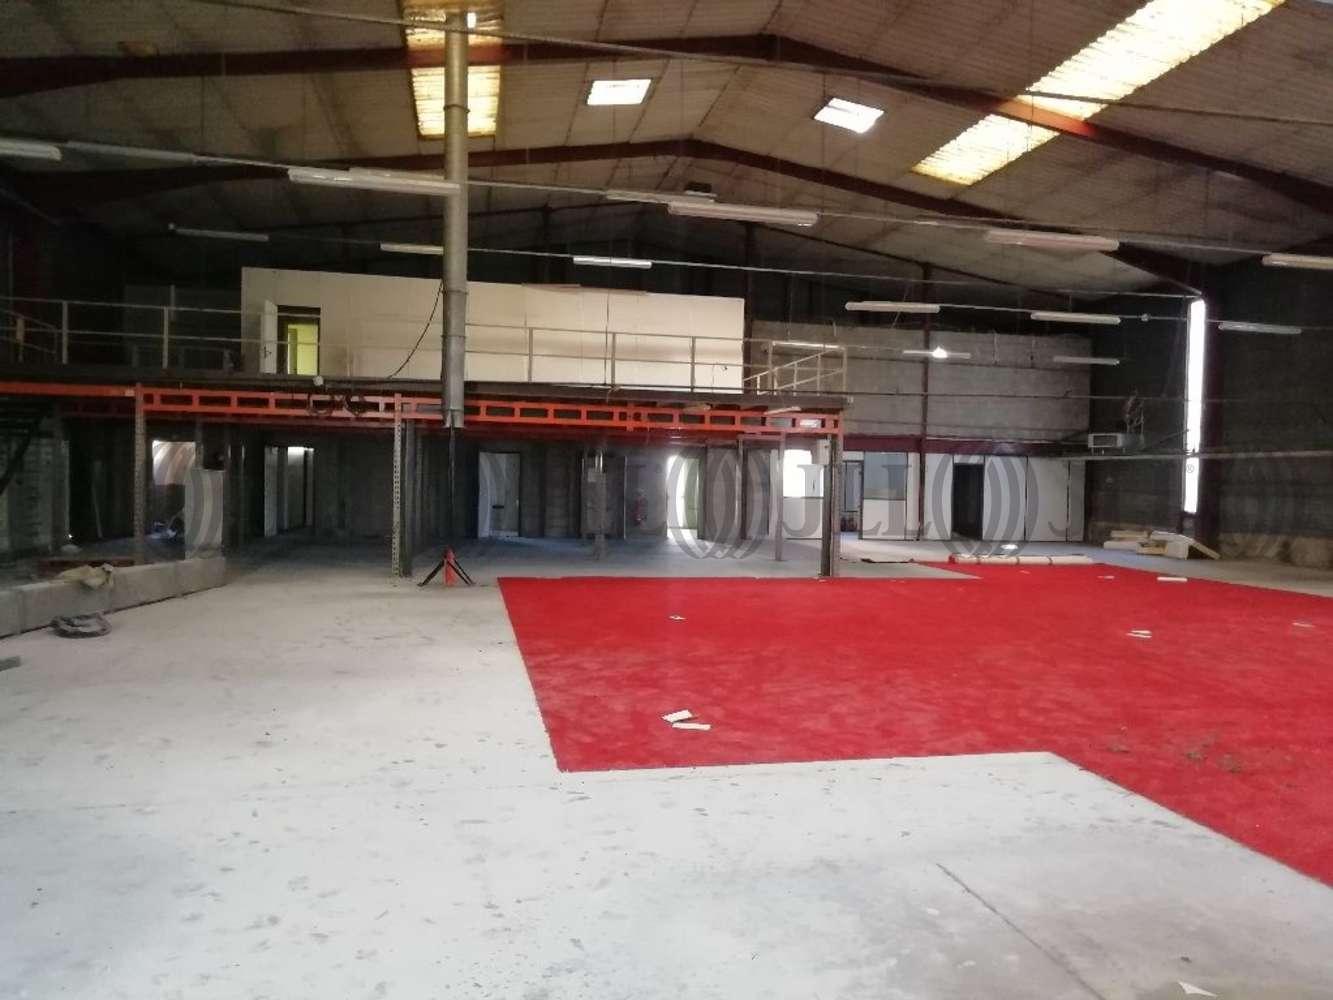 Activités/entrepôt Givors, 69700 - Location entrepot - Proche Lyon (69) - 10815329